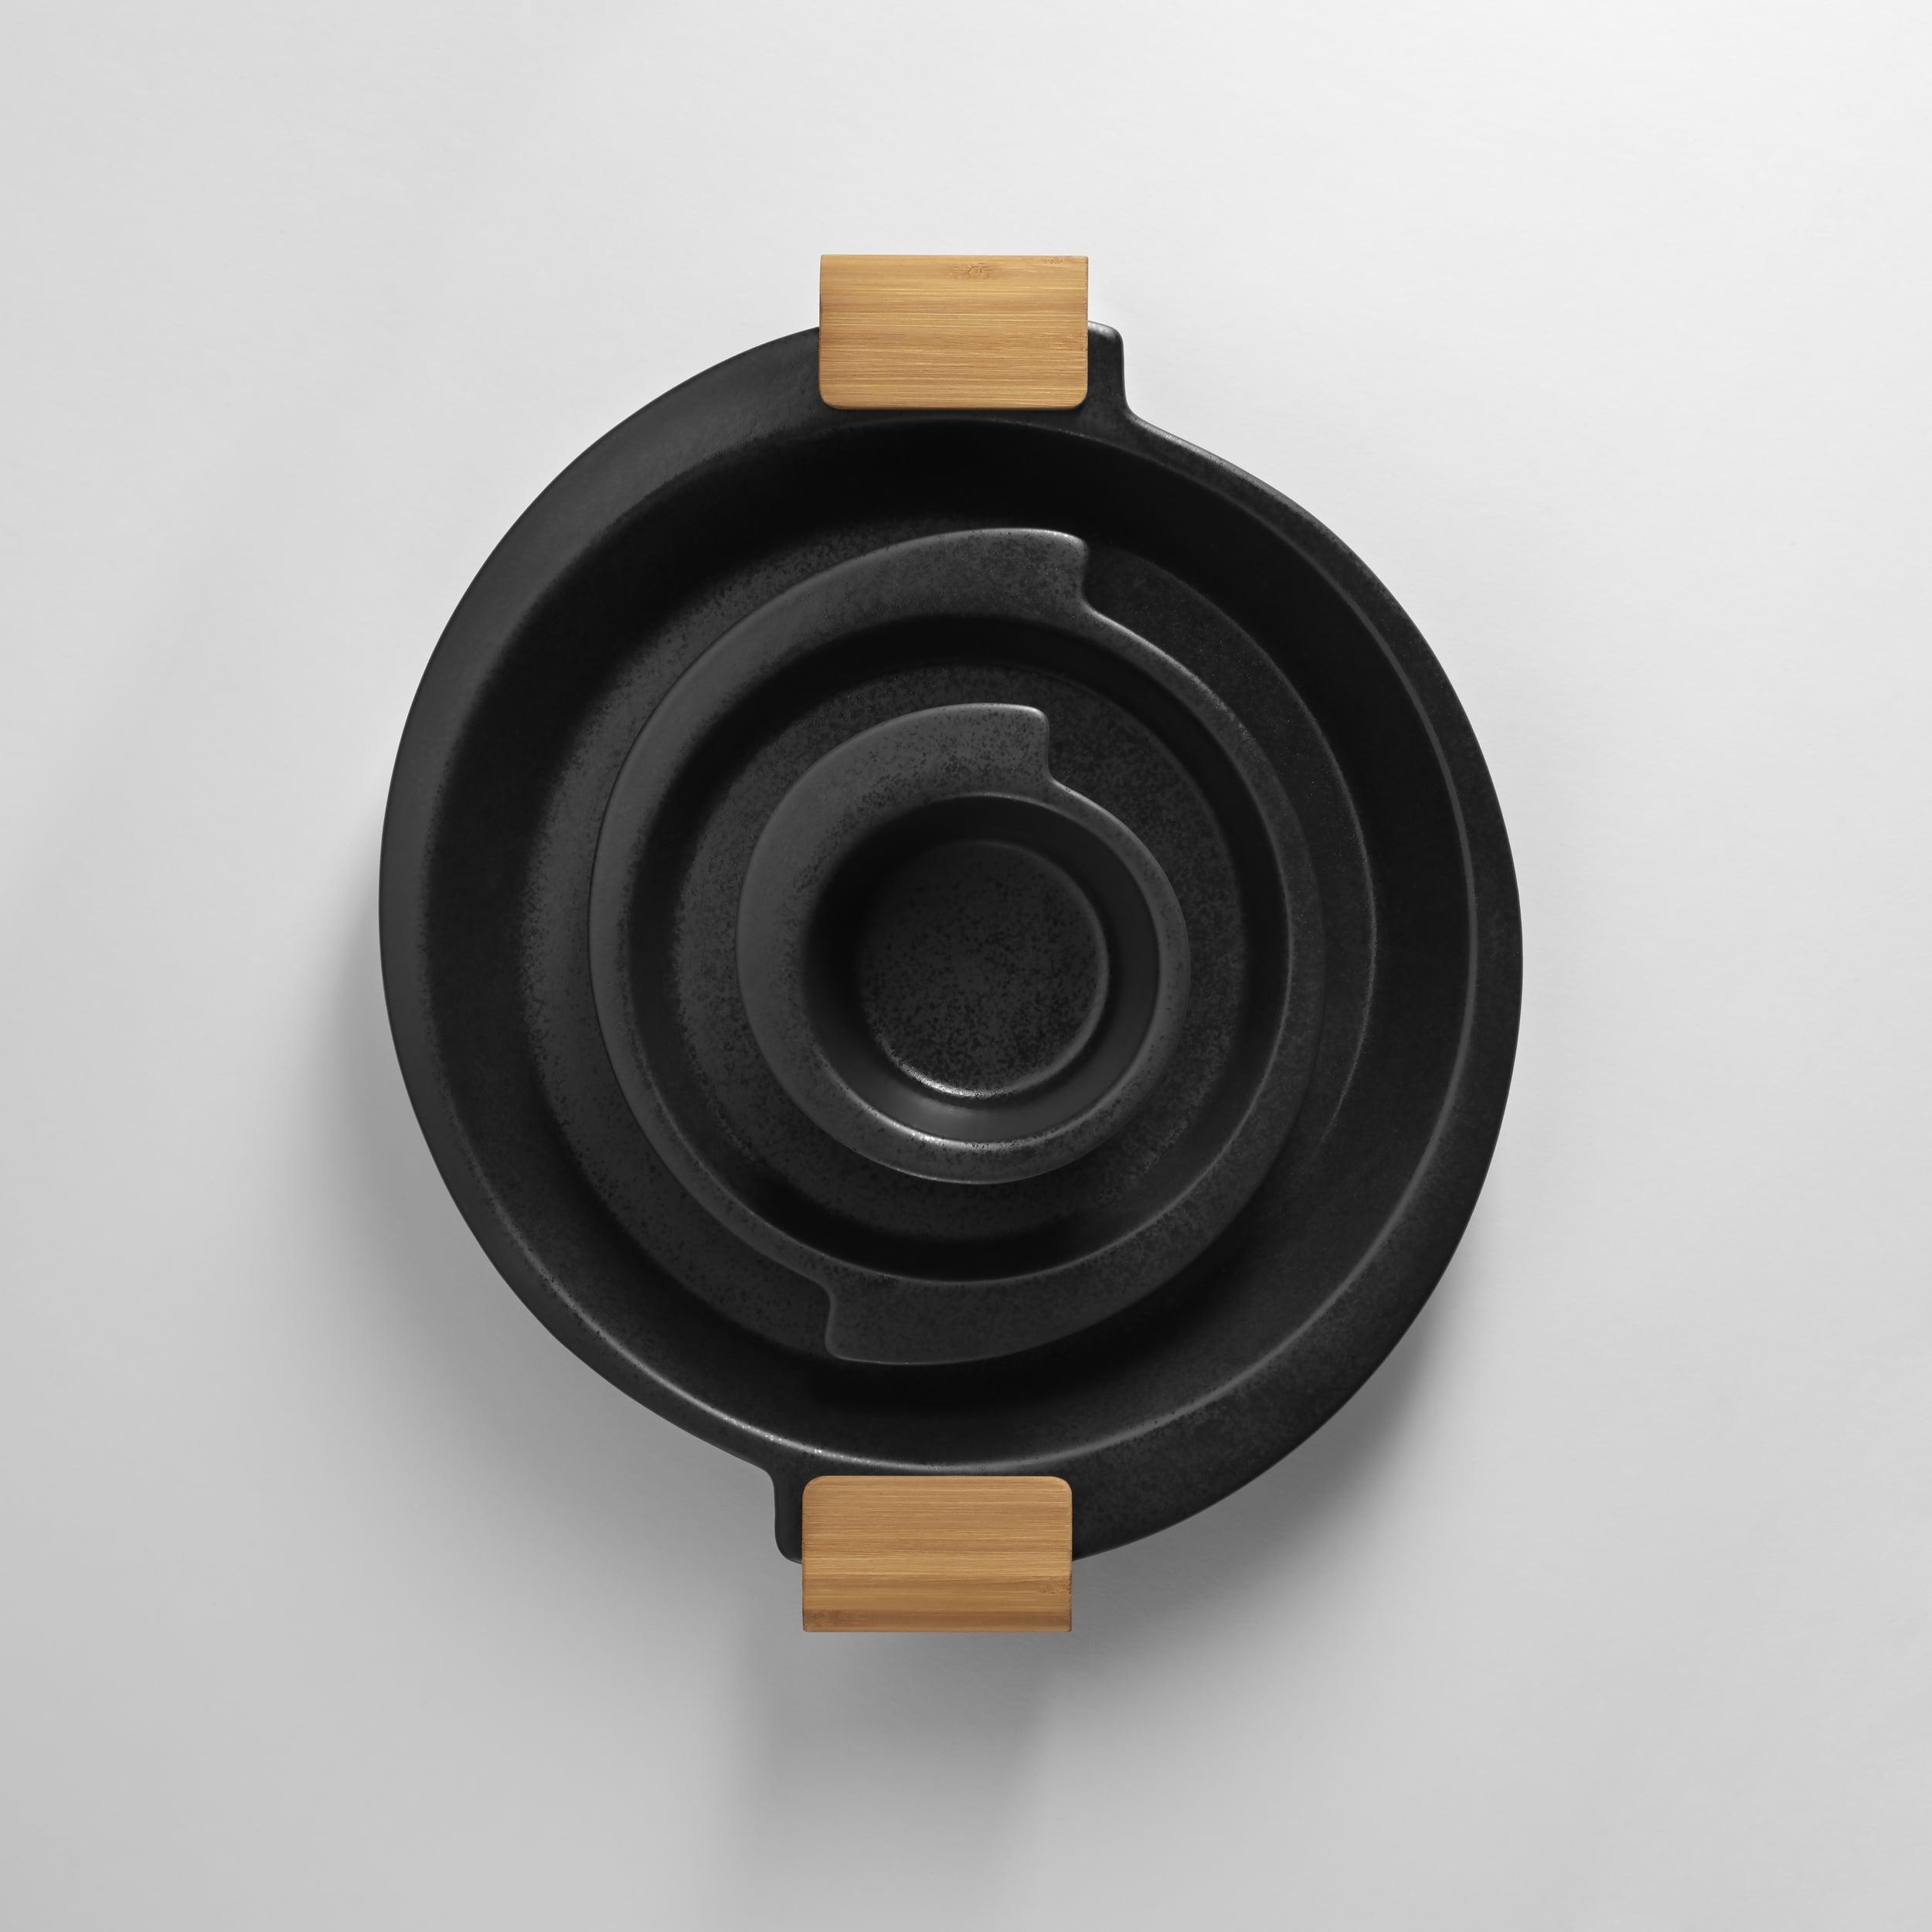 spin_kitchenware_black_piled.jpg